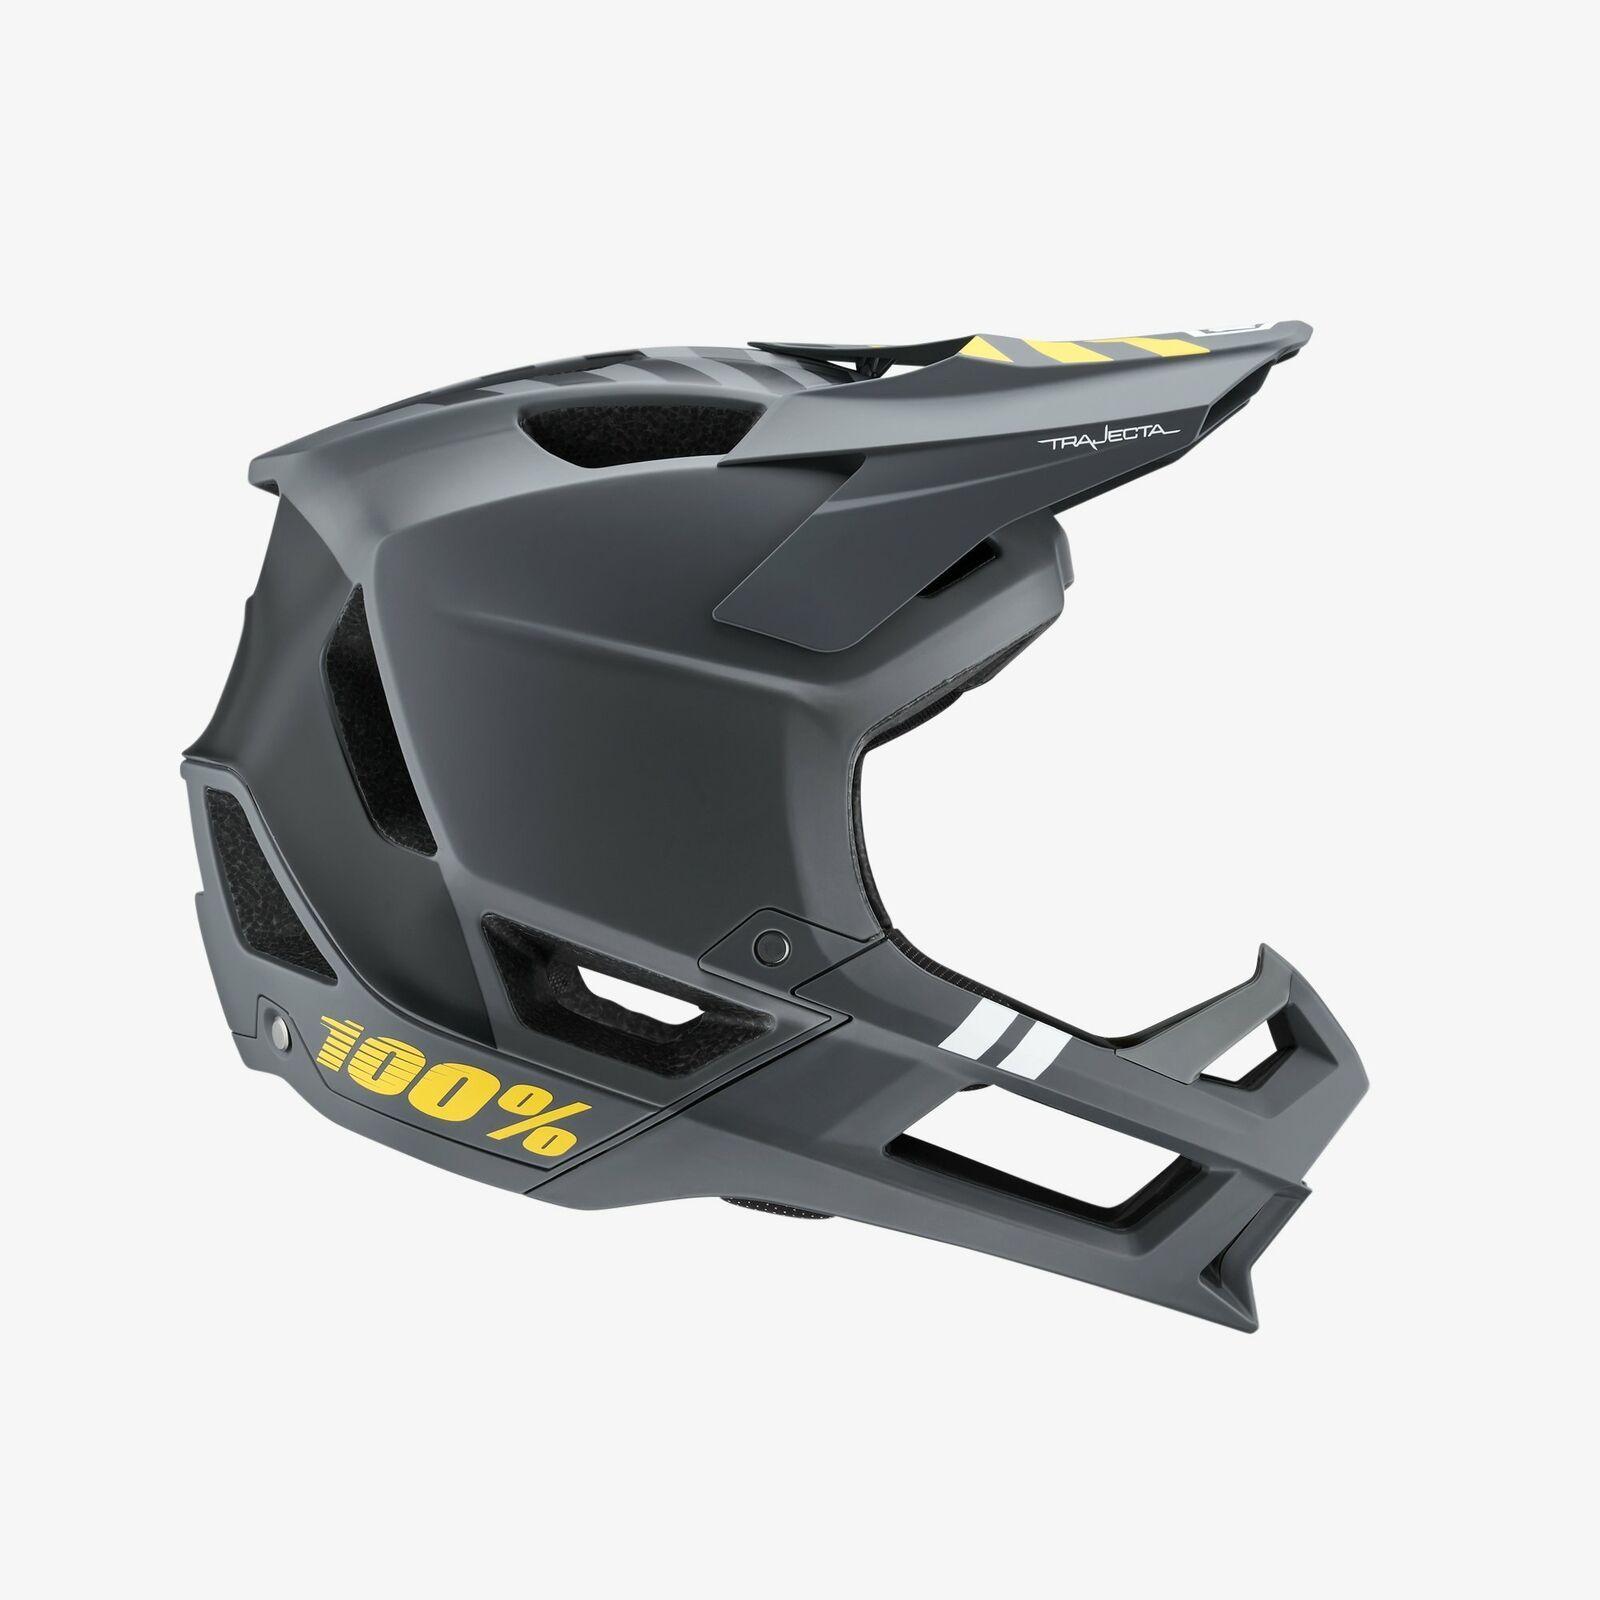 Ride 100 Trajecta Mountain Bike Full Face Enduro Cycling Helmet Charcoal Lg Helmet Full Face Helmets Cycling Helmet